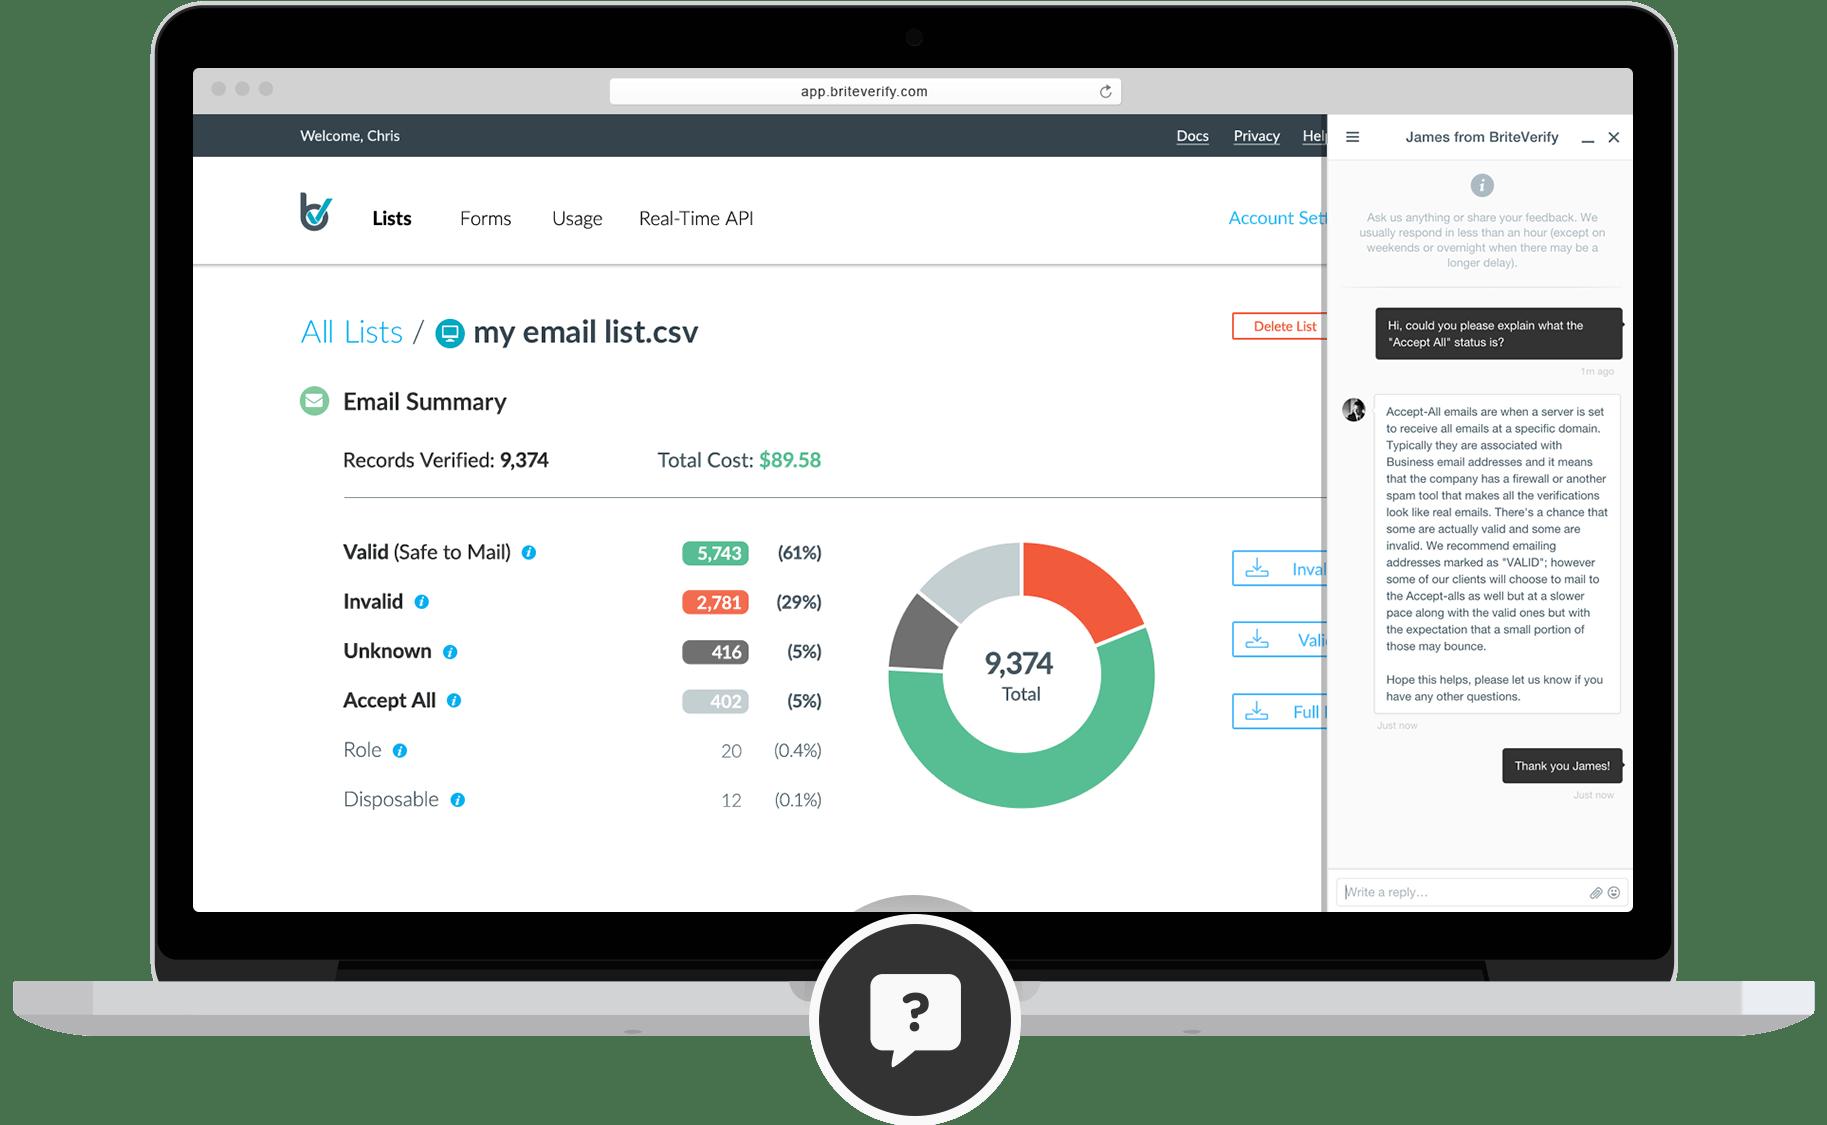 BriteVerify provide 24/7 in-app support